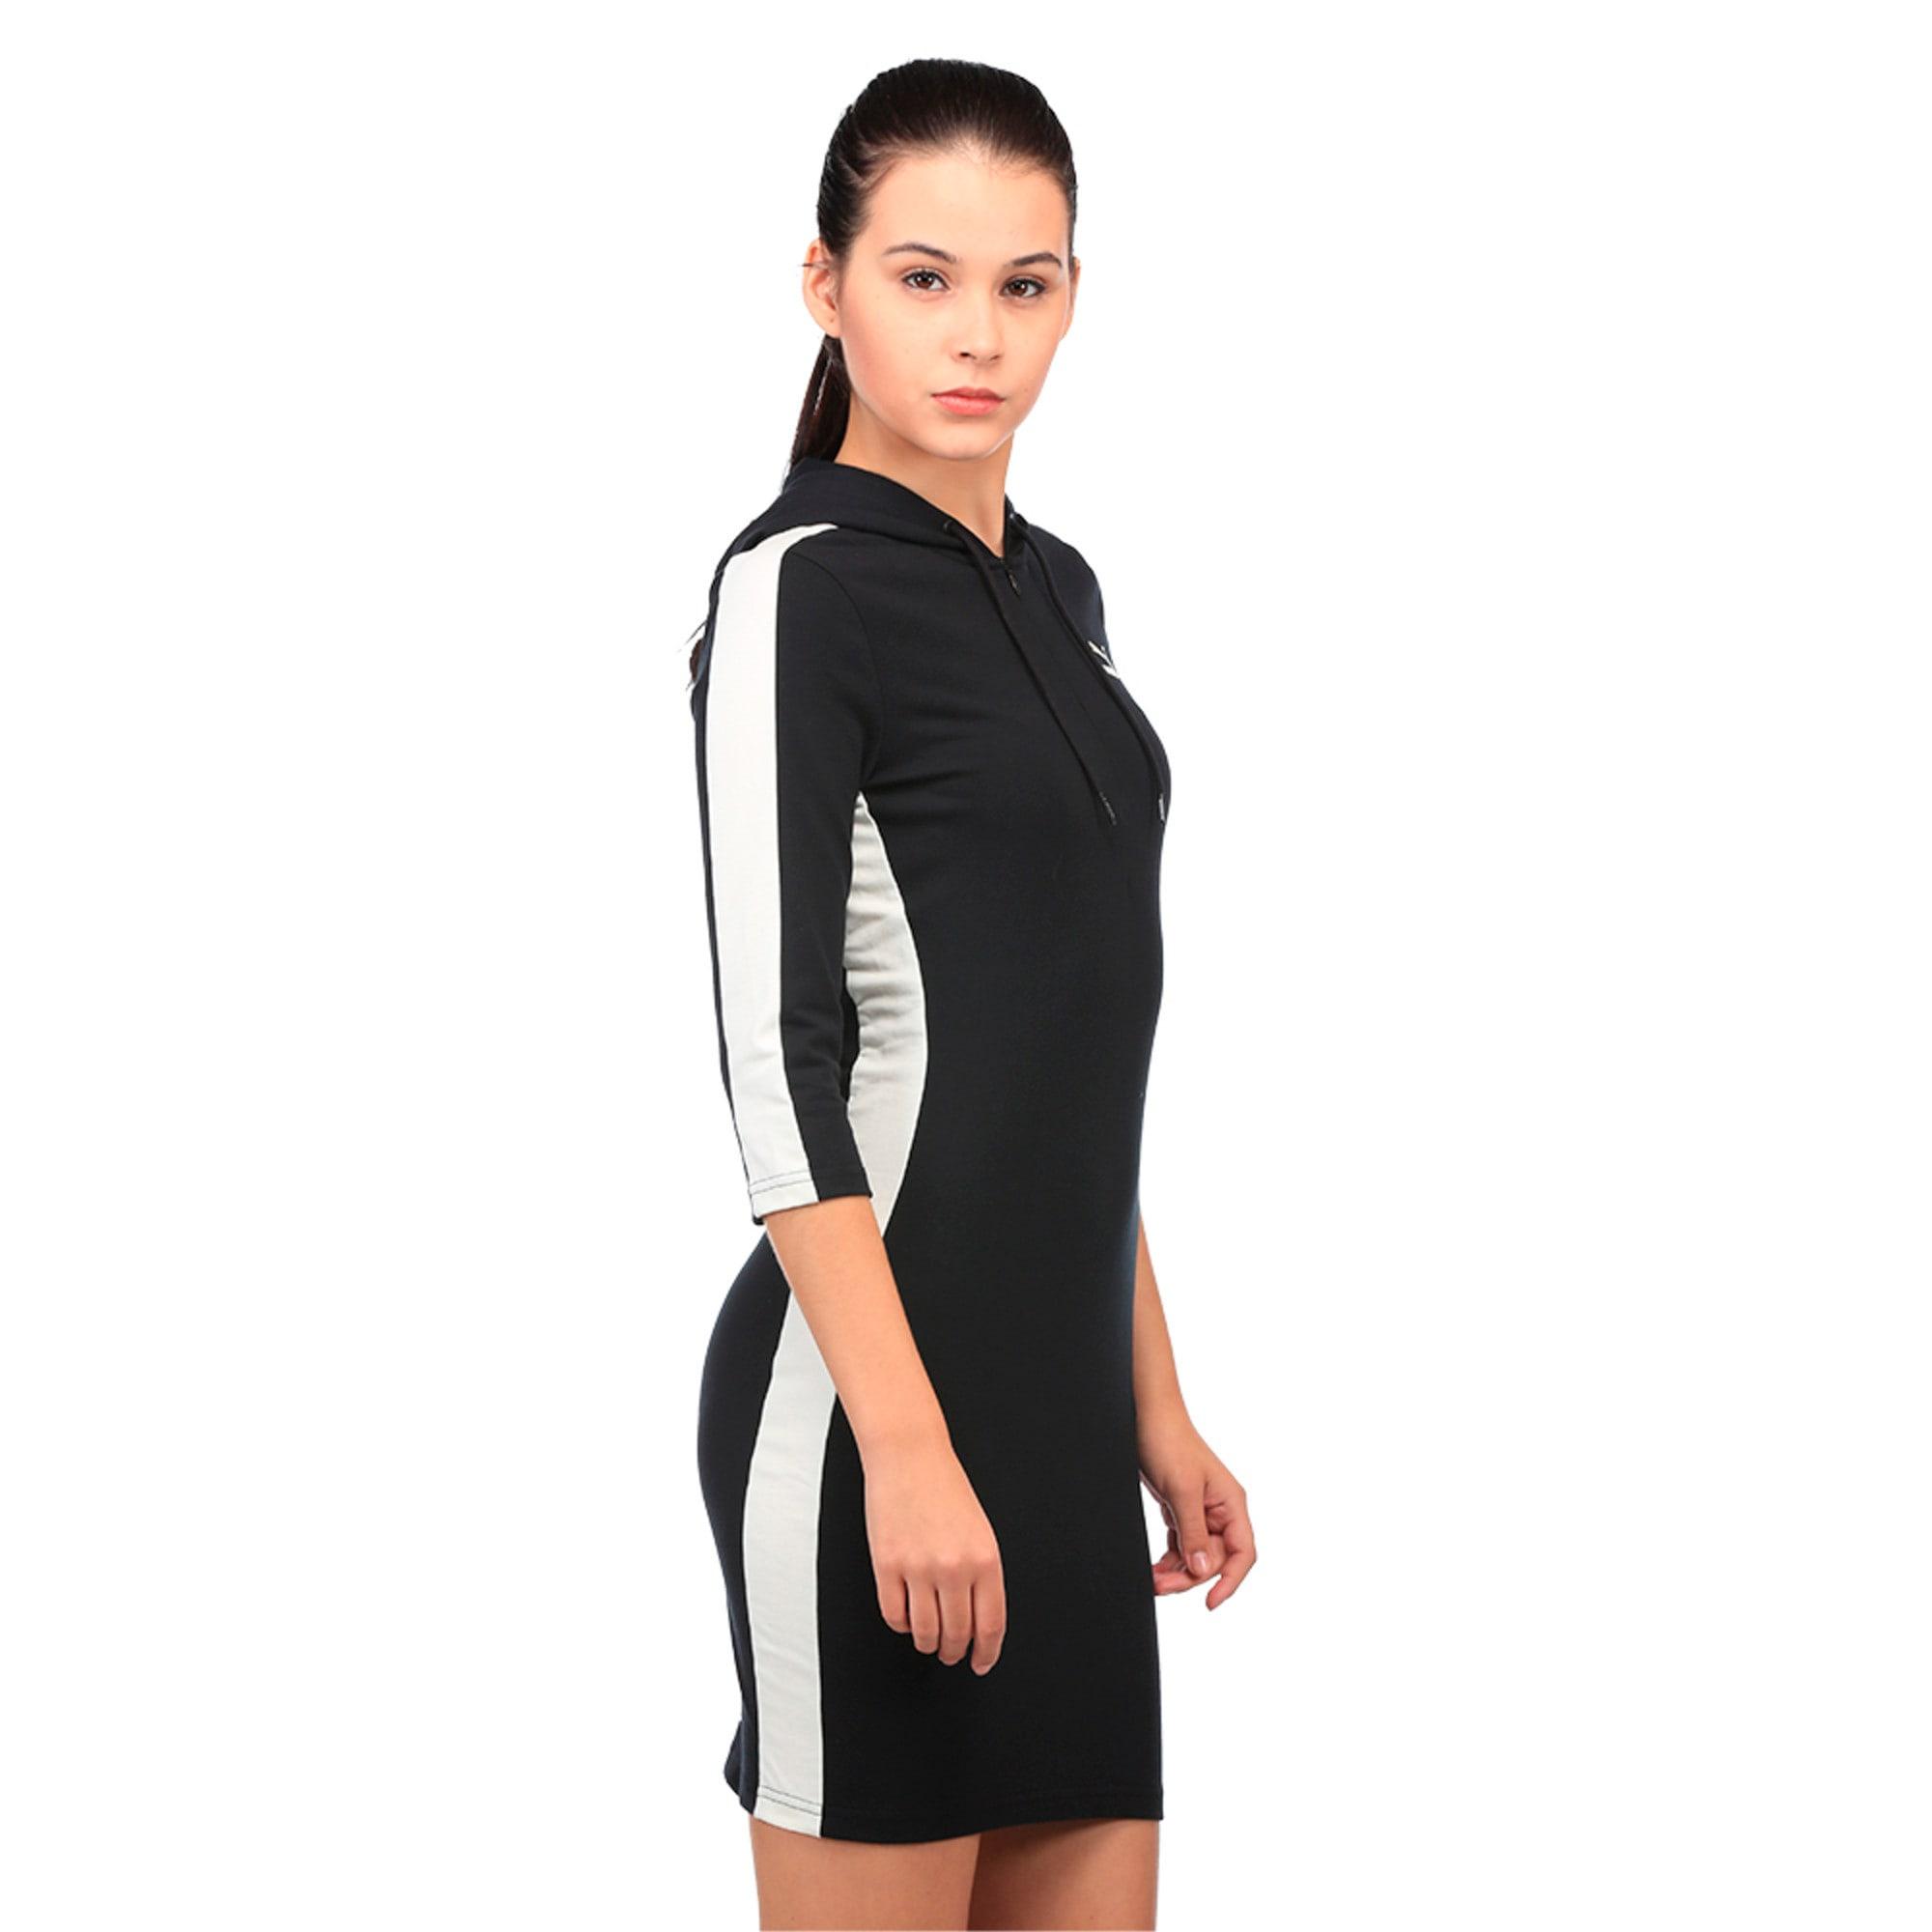 Thumbnail 2 of Archive Women's T7 Dress, Puma Black, medium-IND